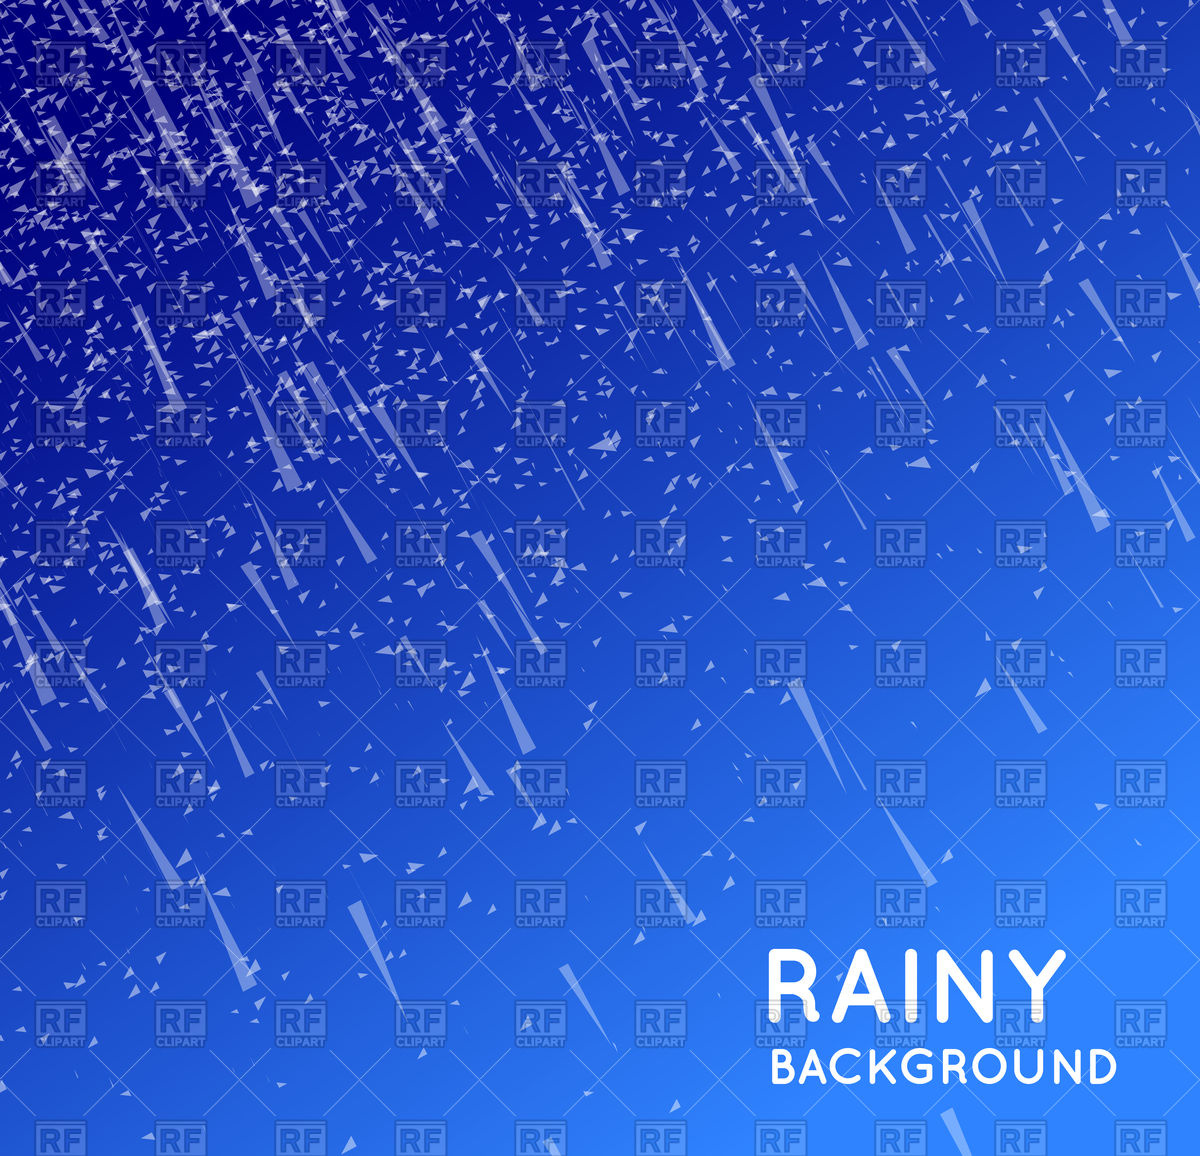 Rainy sky background Vector Image #107065.